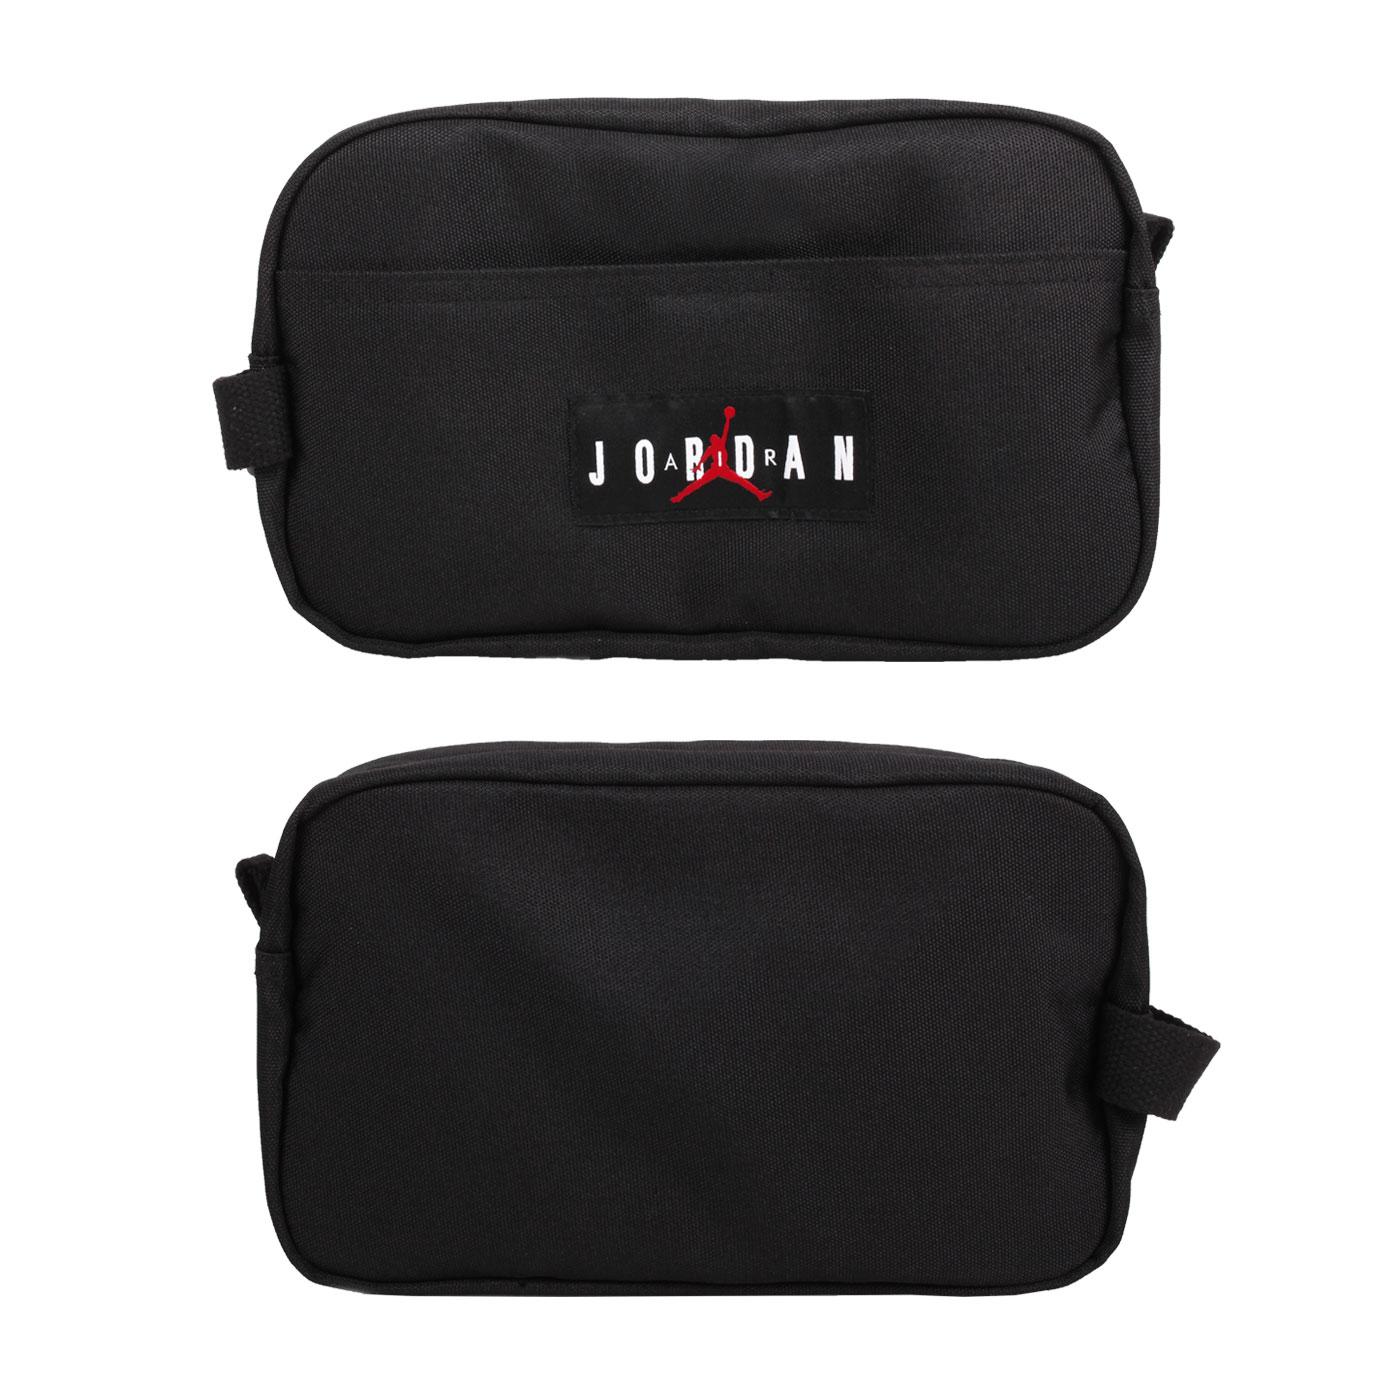 NIKE JORDAN 旅行收納包 JD2043018AD-001 - 黑白紅